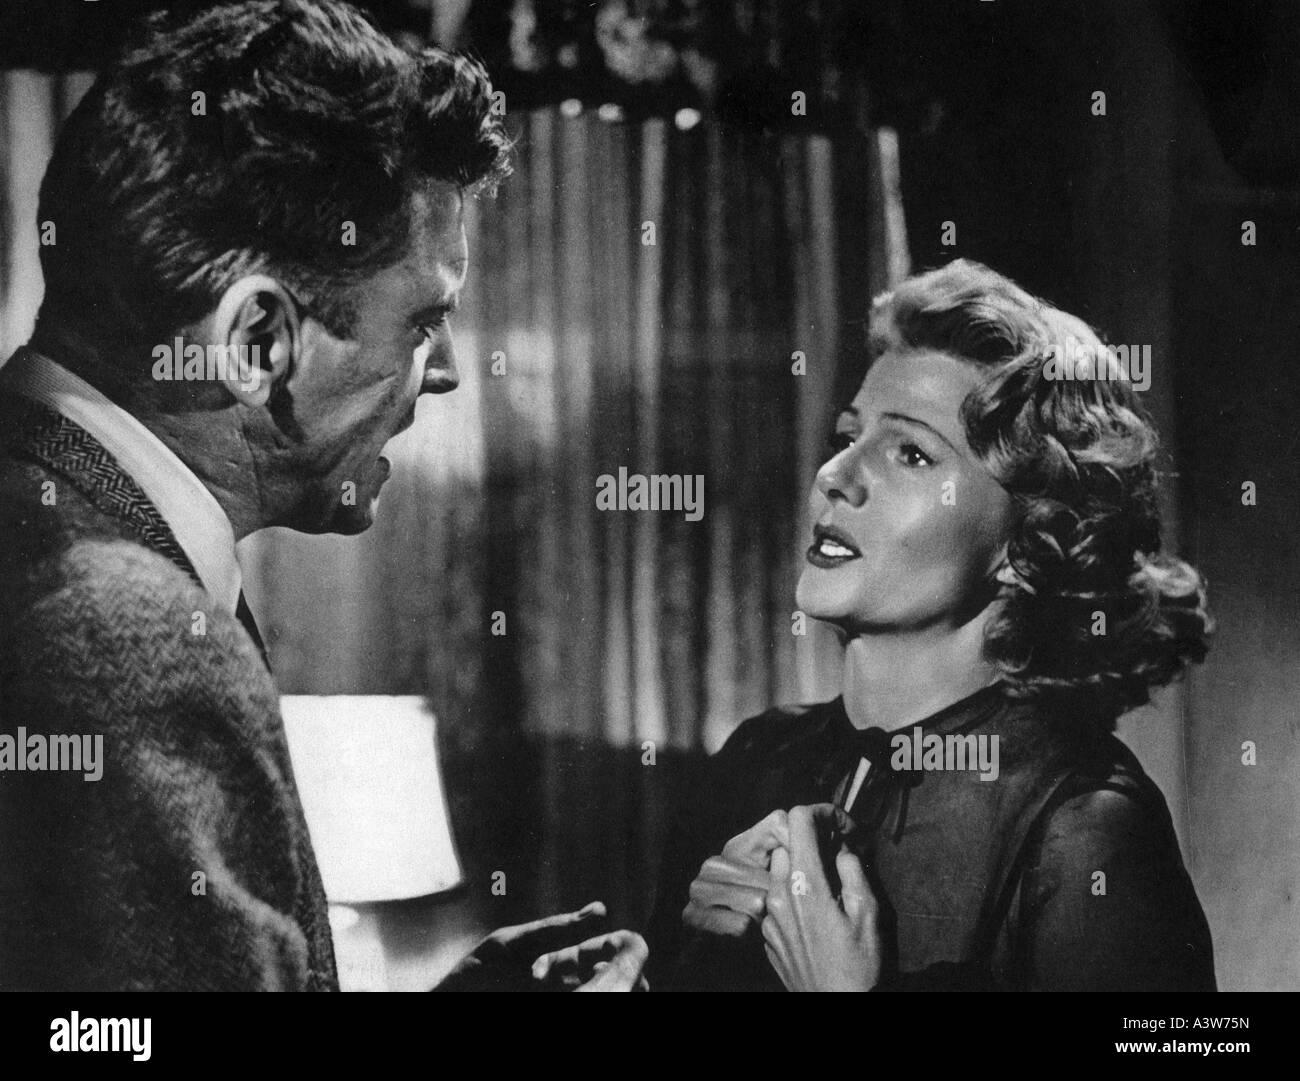 SEPARATE TABLES 1958 UA film with Rita Hayworth and Burt Lancaster - Stock Image